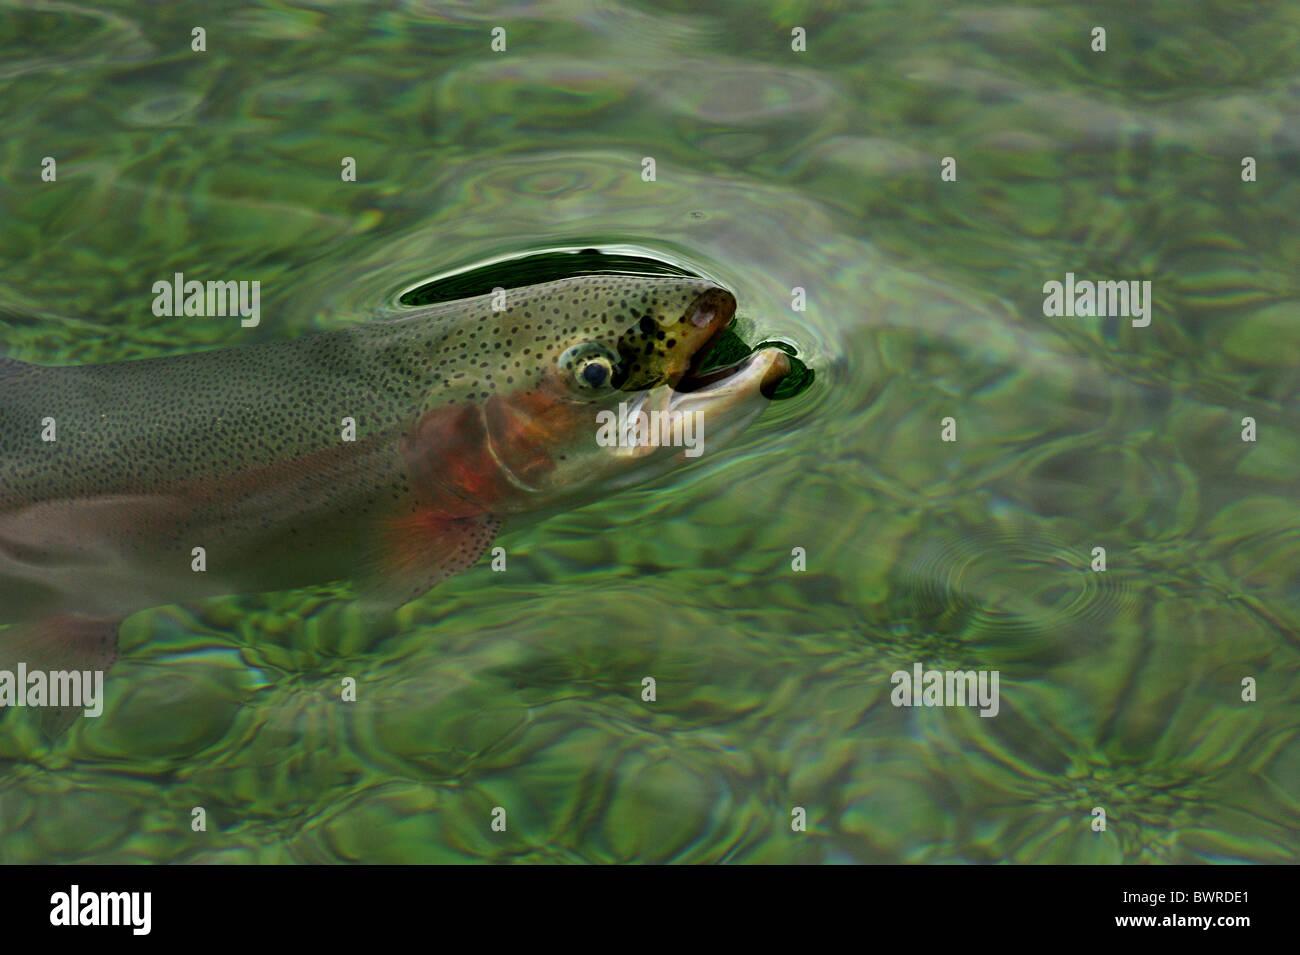 Rainbow Trout, Oncorhynchus mykiss, captive - Stock Image